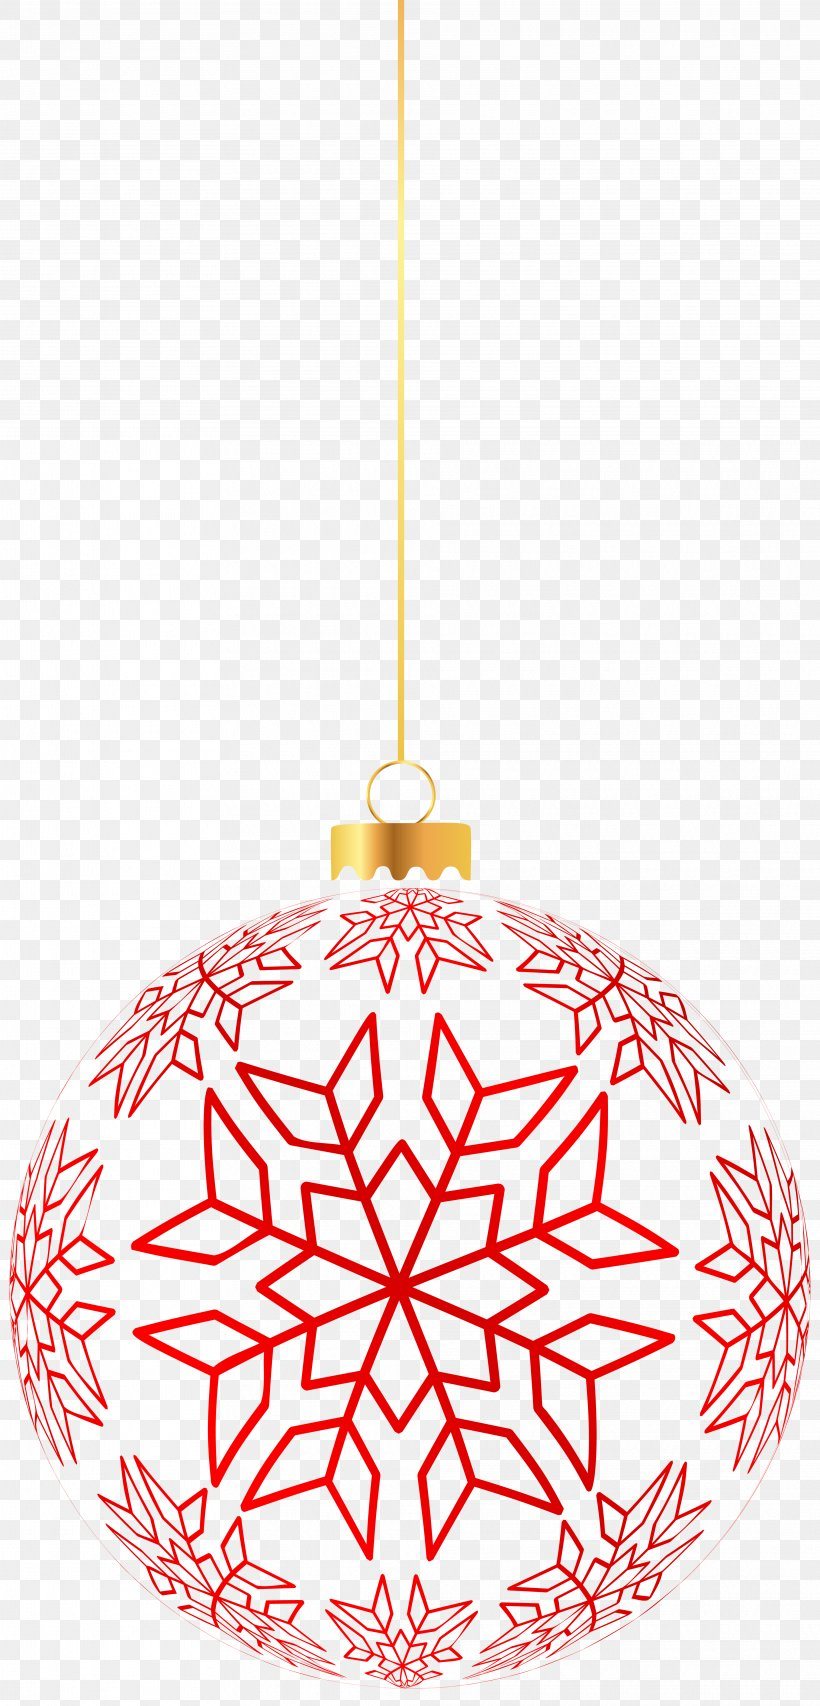 Christmas Ornament Santa Claus Clip Art, PNG, 3845x8000px, Christmas Ornament, Ball, Candy Cane, Christmas, Christmas Decoration Download Free